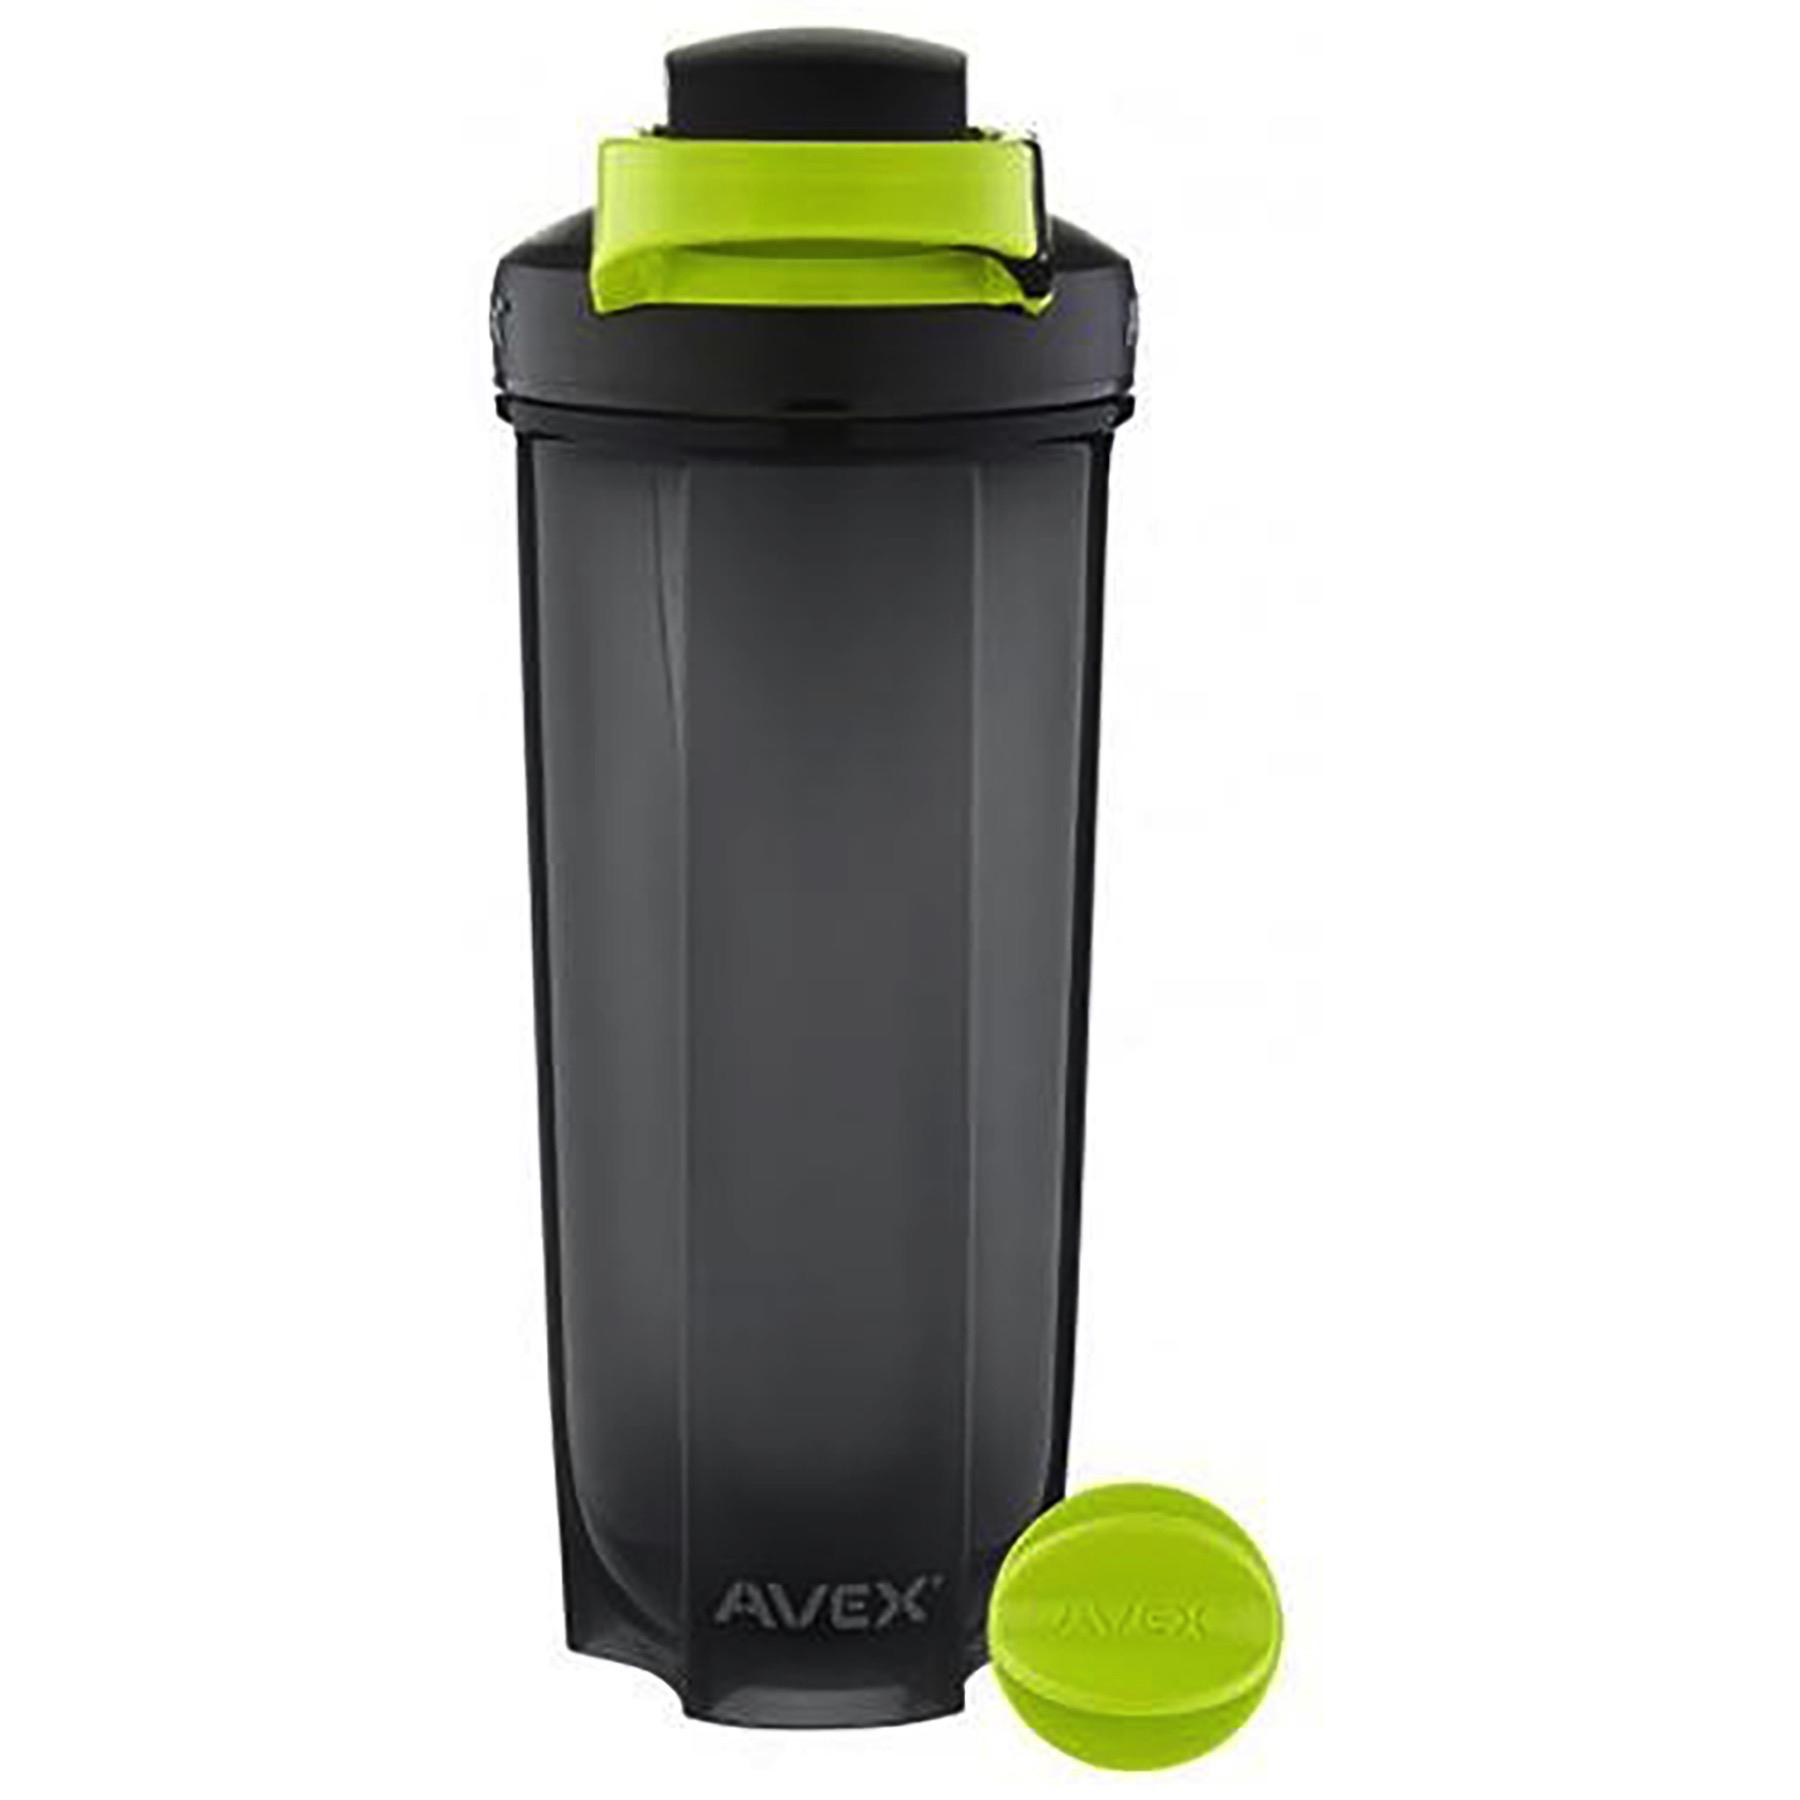 Protein Shaker Keyring: Avex MixFit Shaker 28oz Black W/Electric Green Carabiner